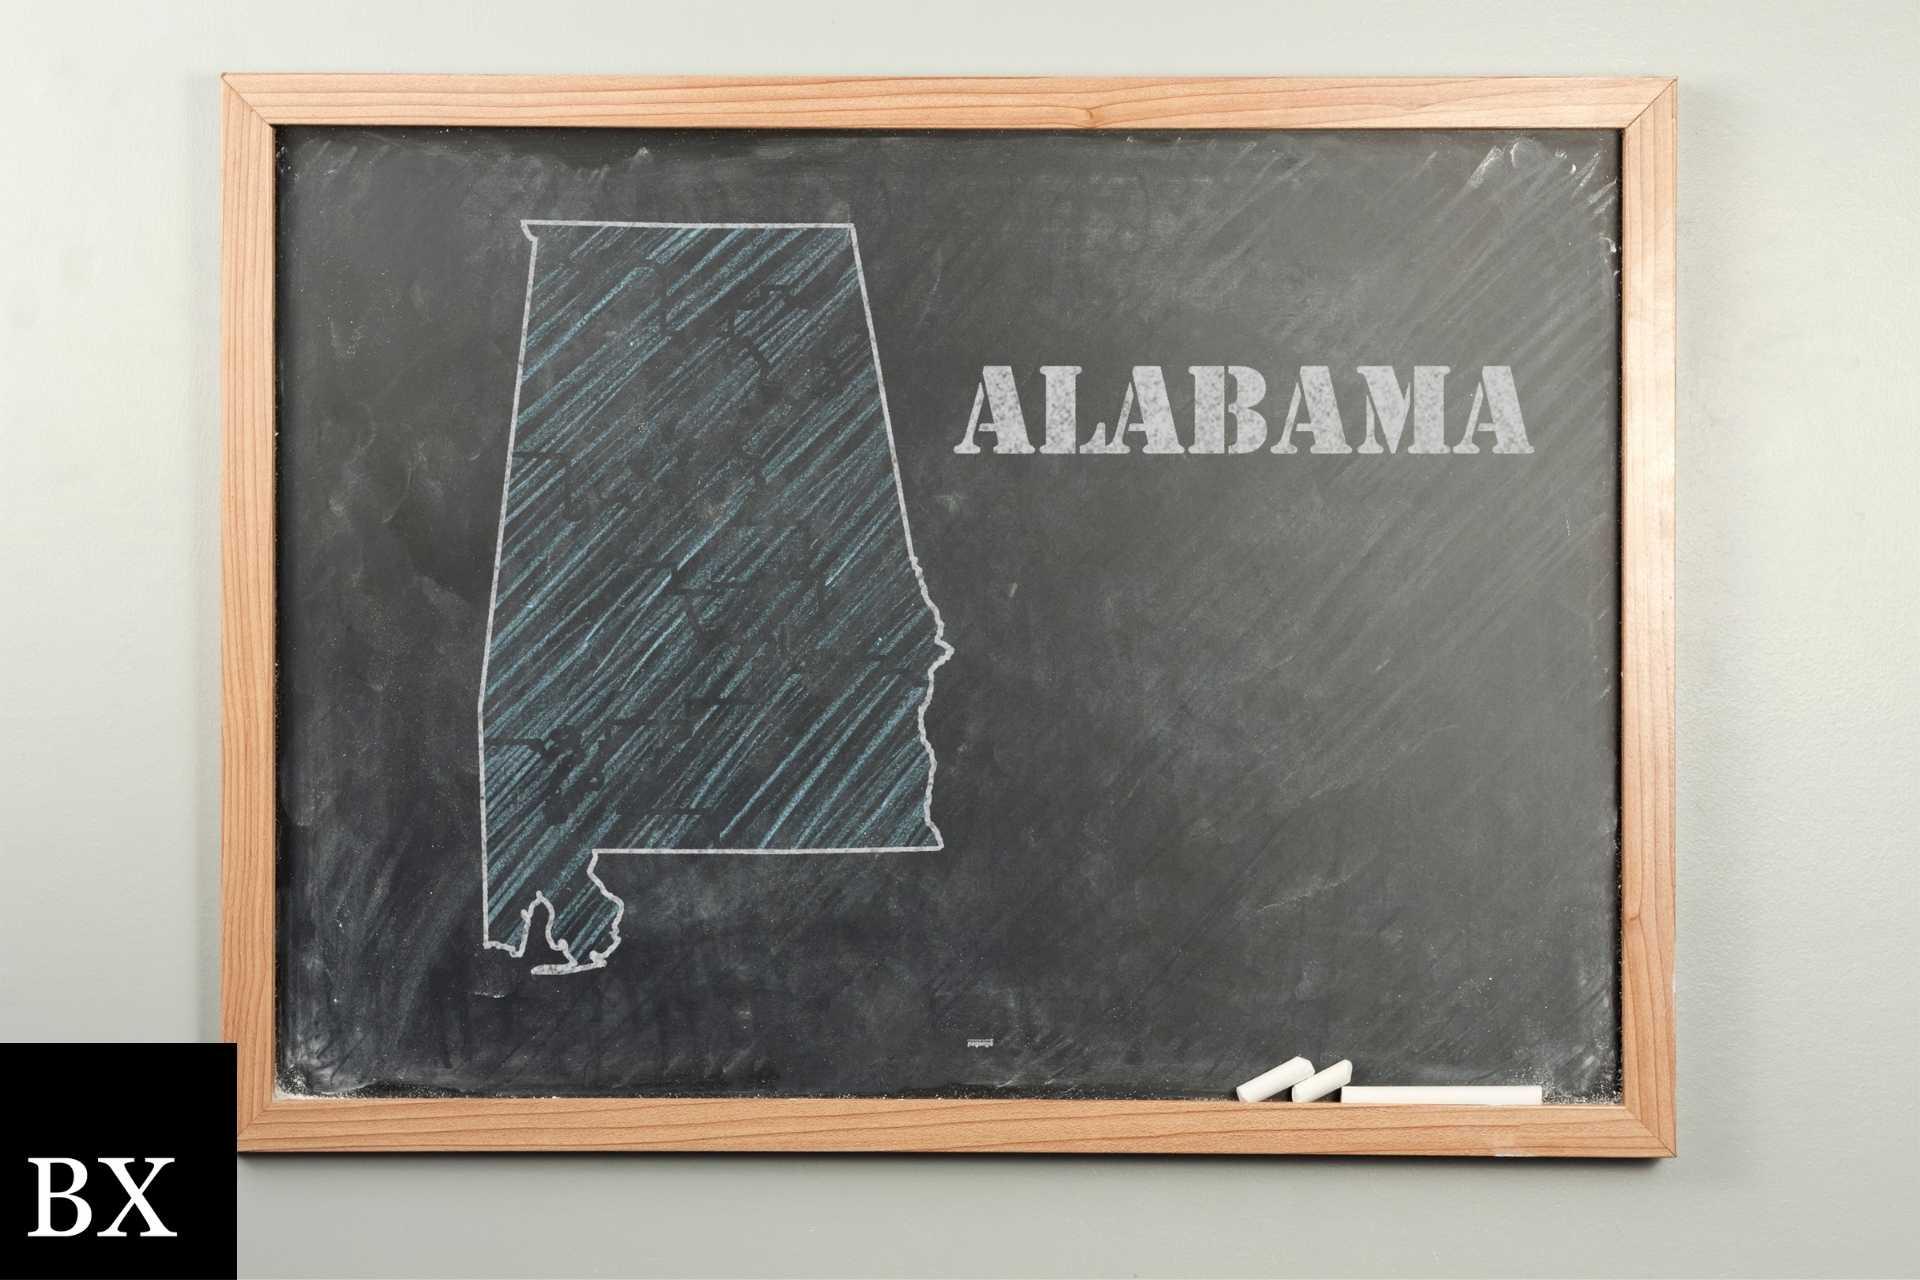 Alabama Money Transmitter Bond